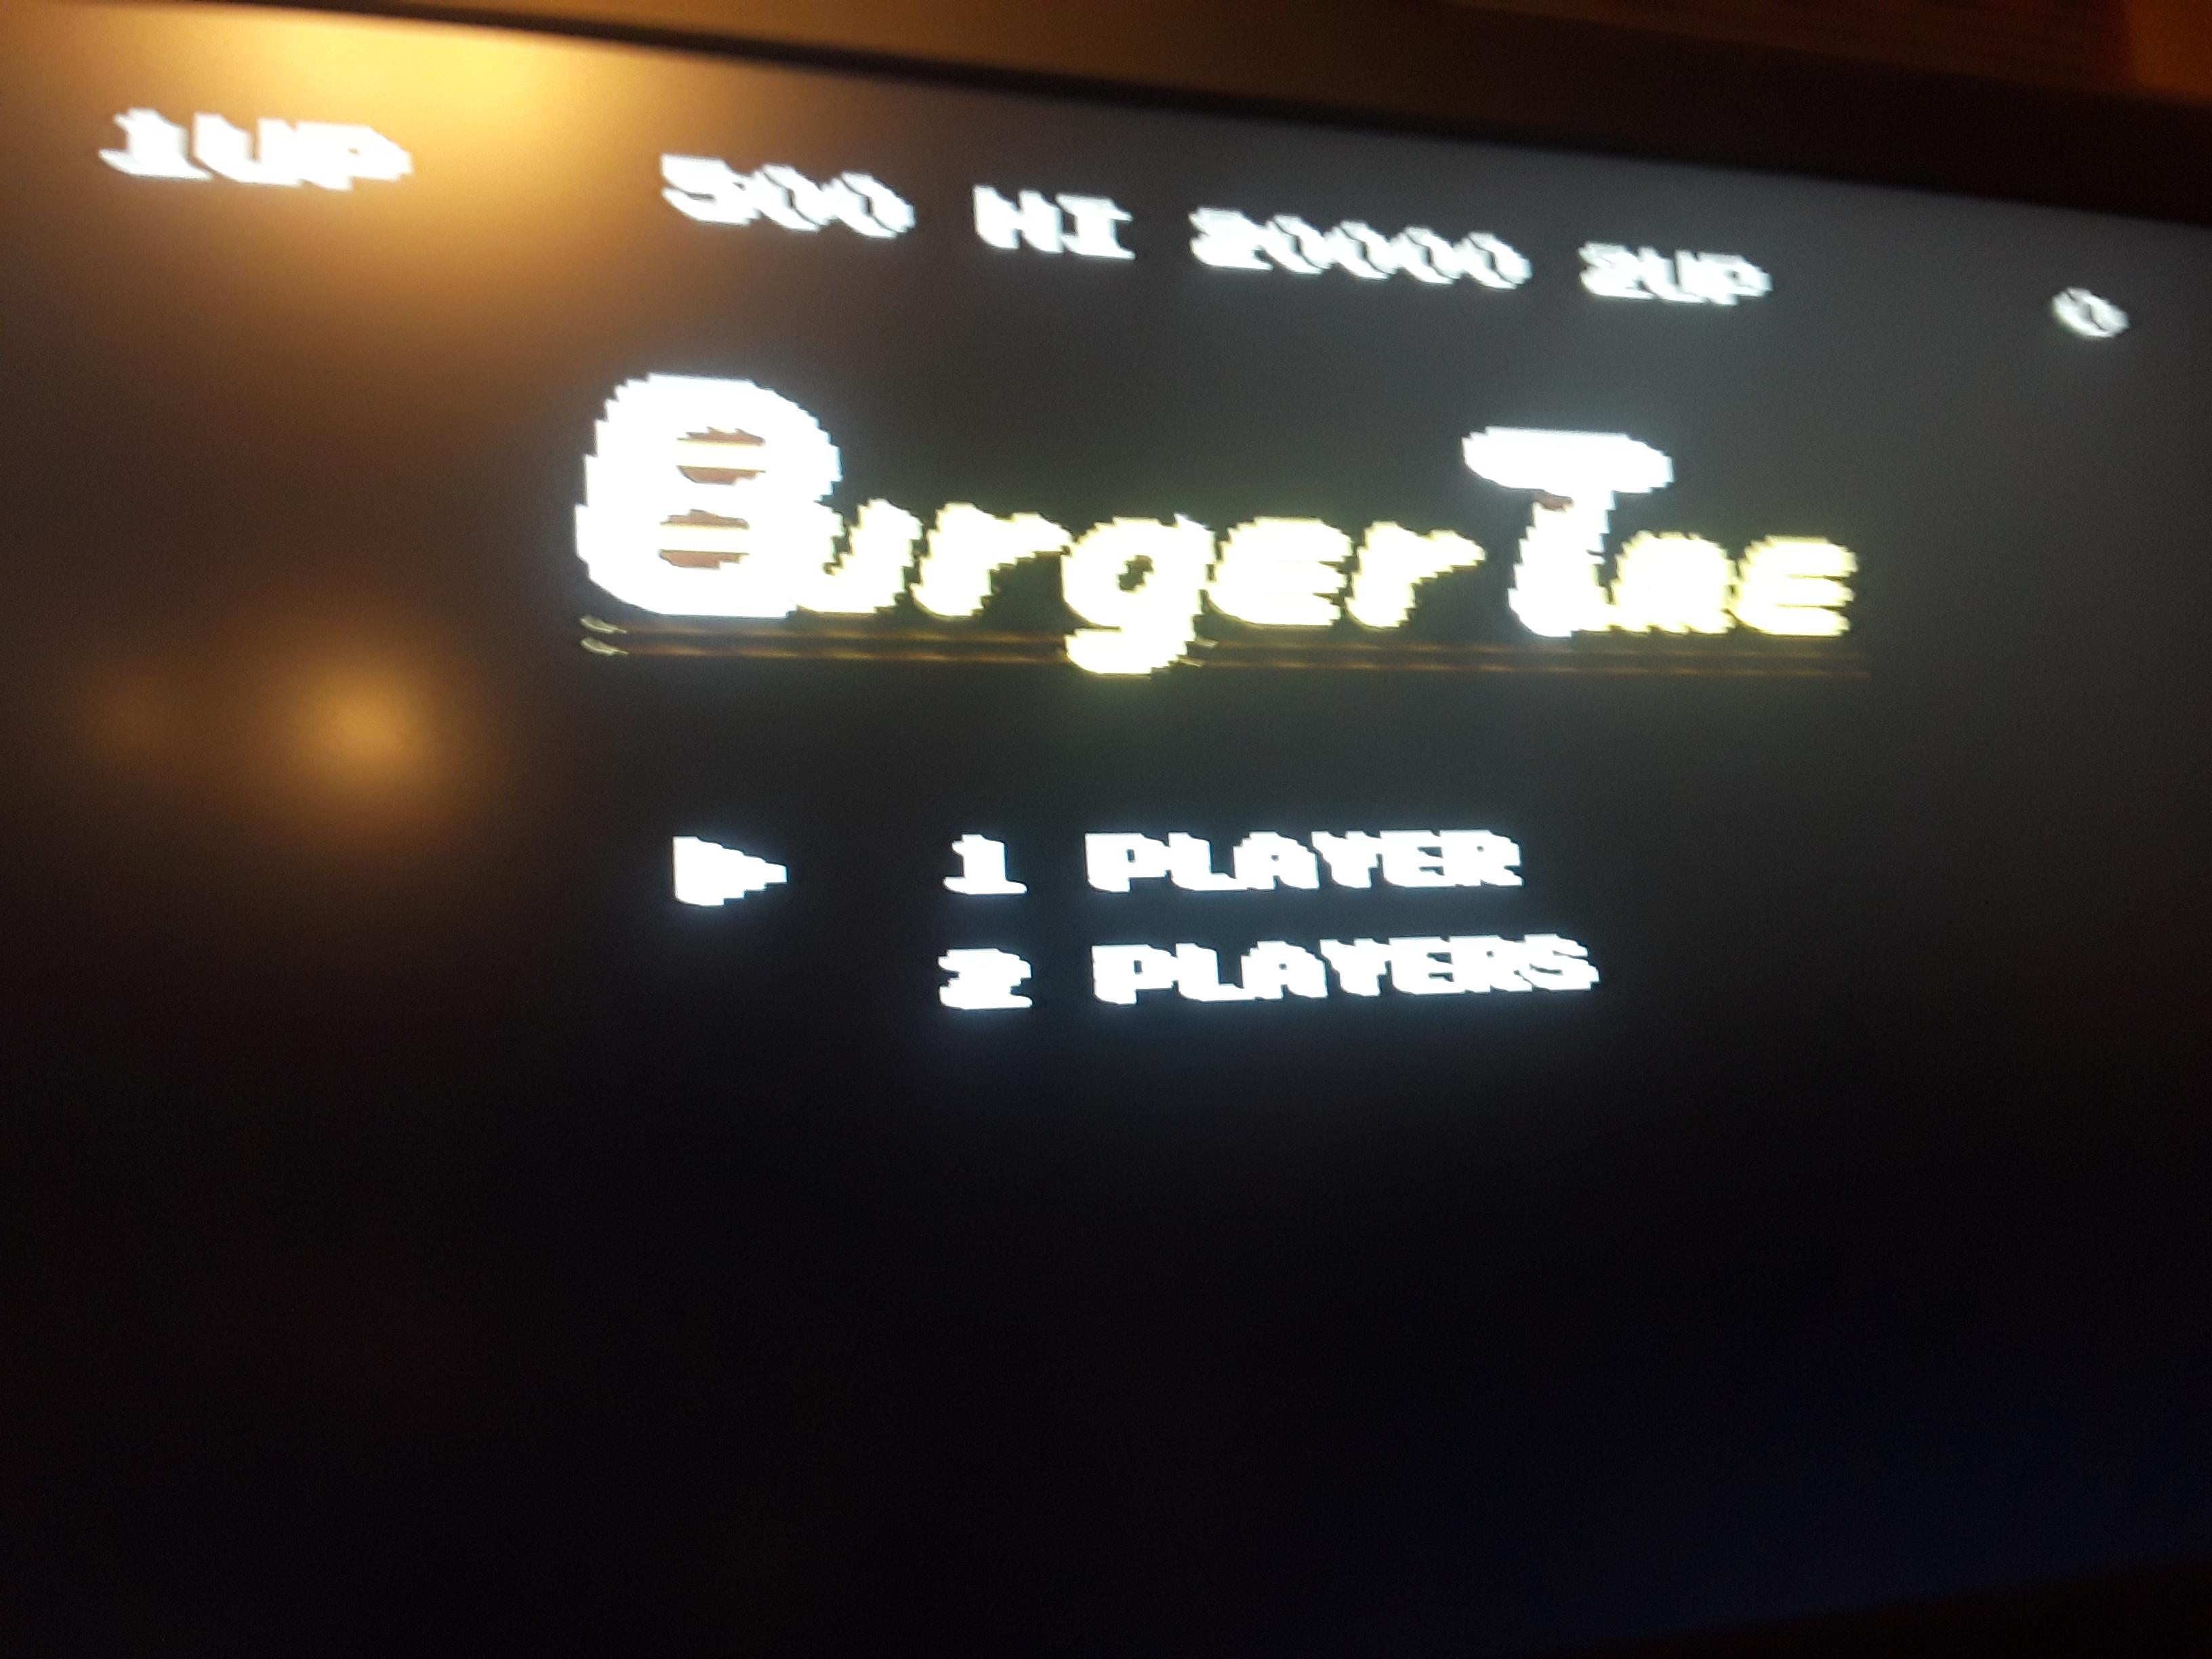 BurgerTime 500 points